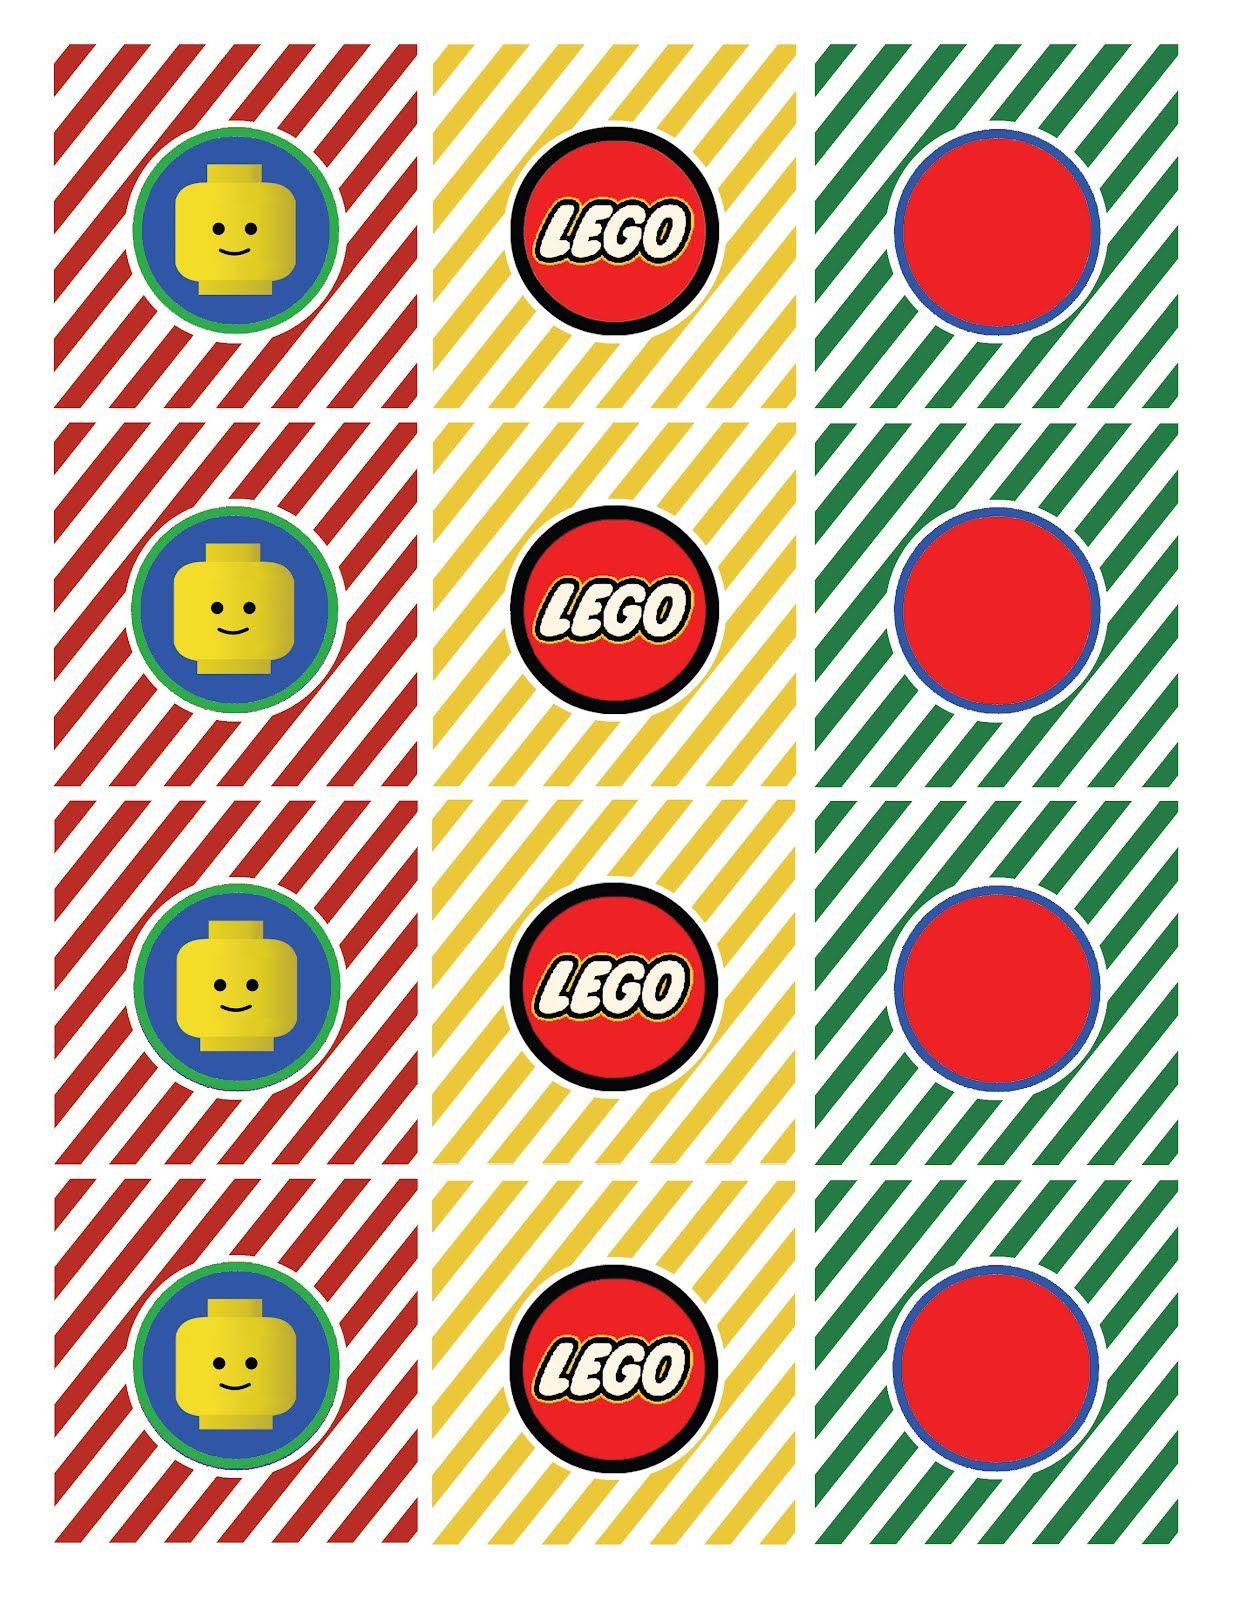 Free Lego Printables   Lego Straw Flag Says Drink Me Lego Tented - Free Printable Lego Cupcake Toppers